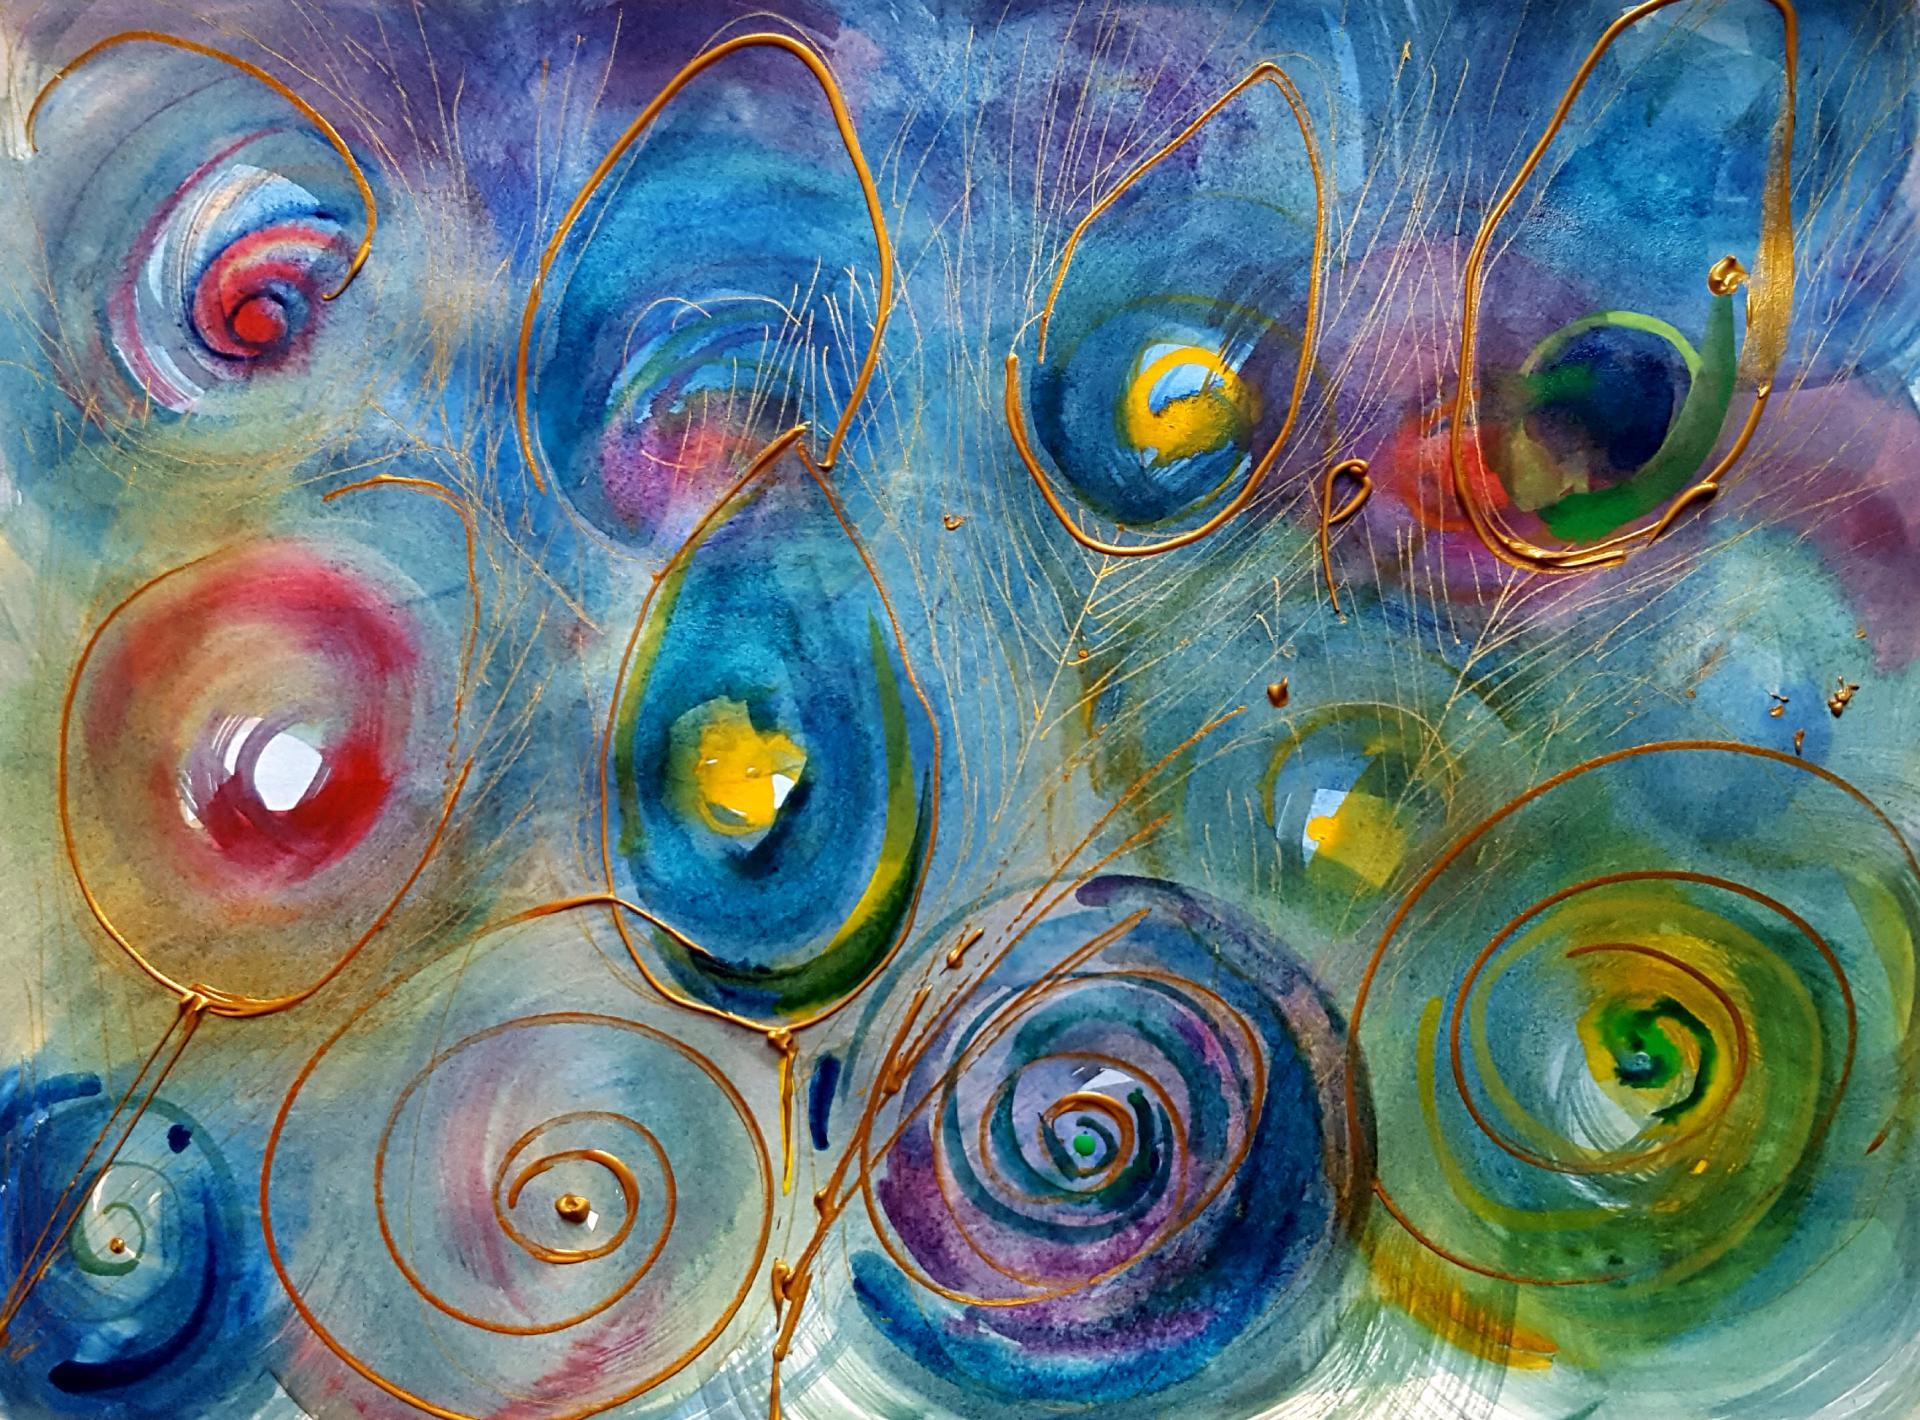 Aquarell der Künstlerin Antje Koßmagk